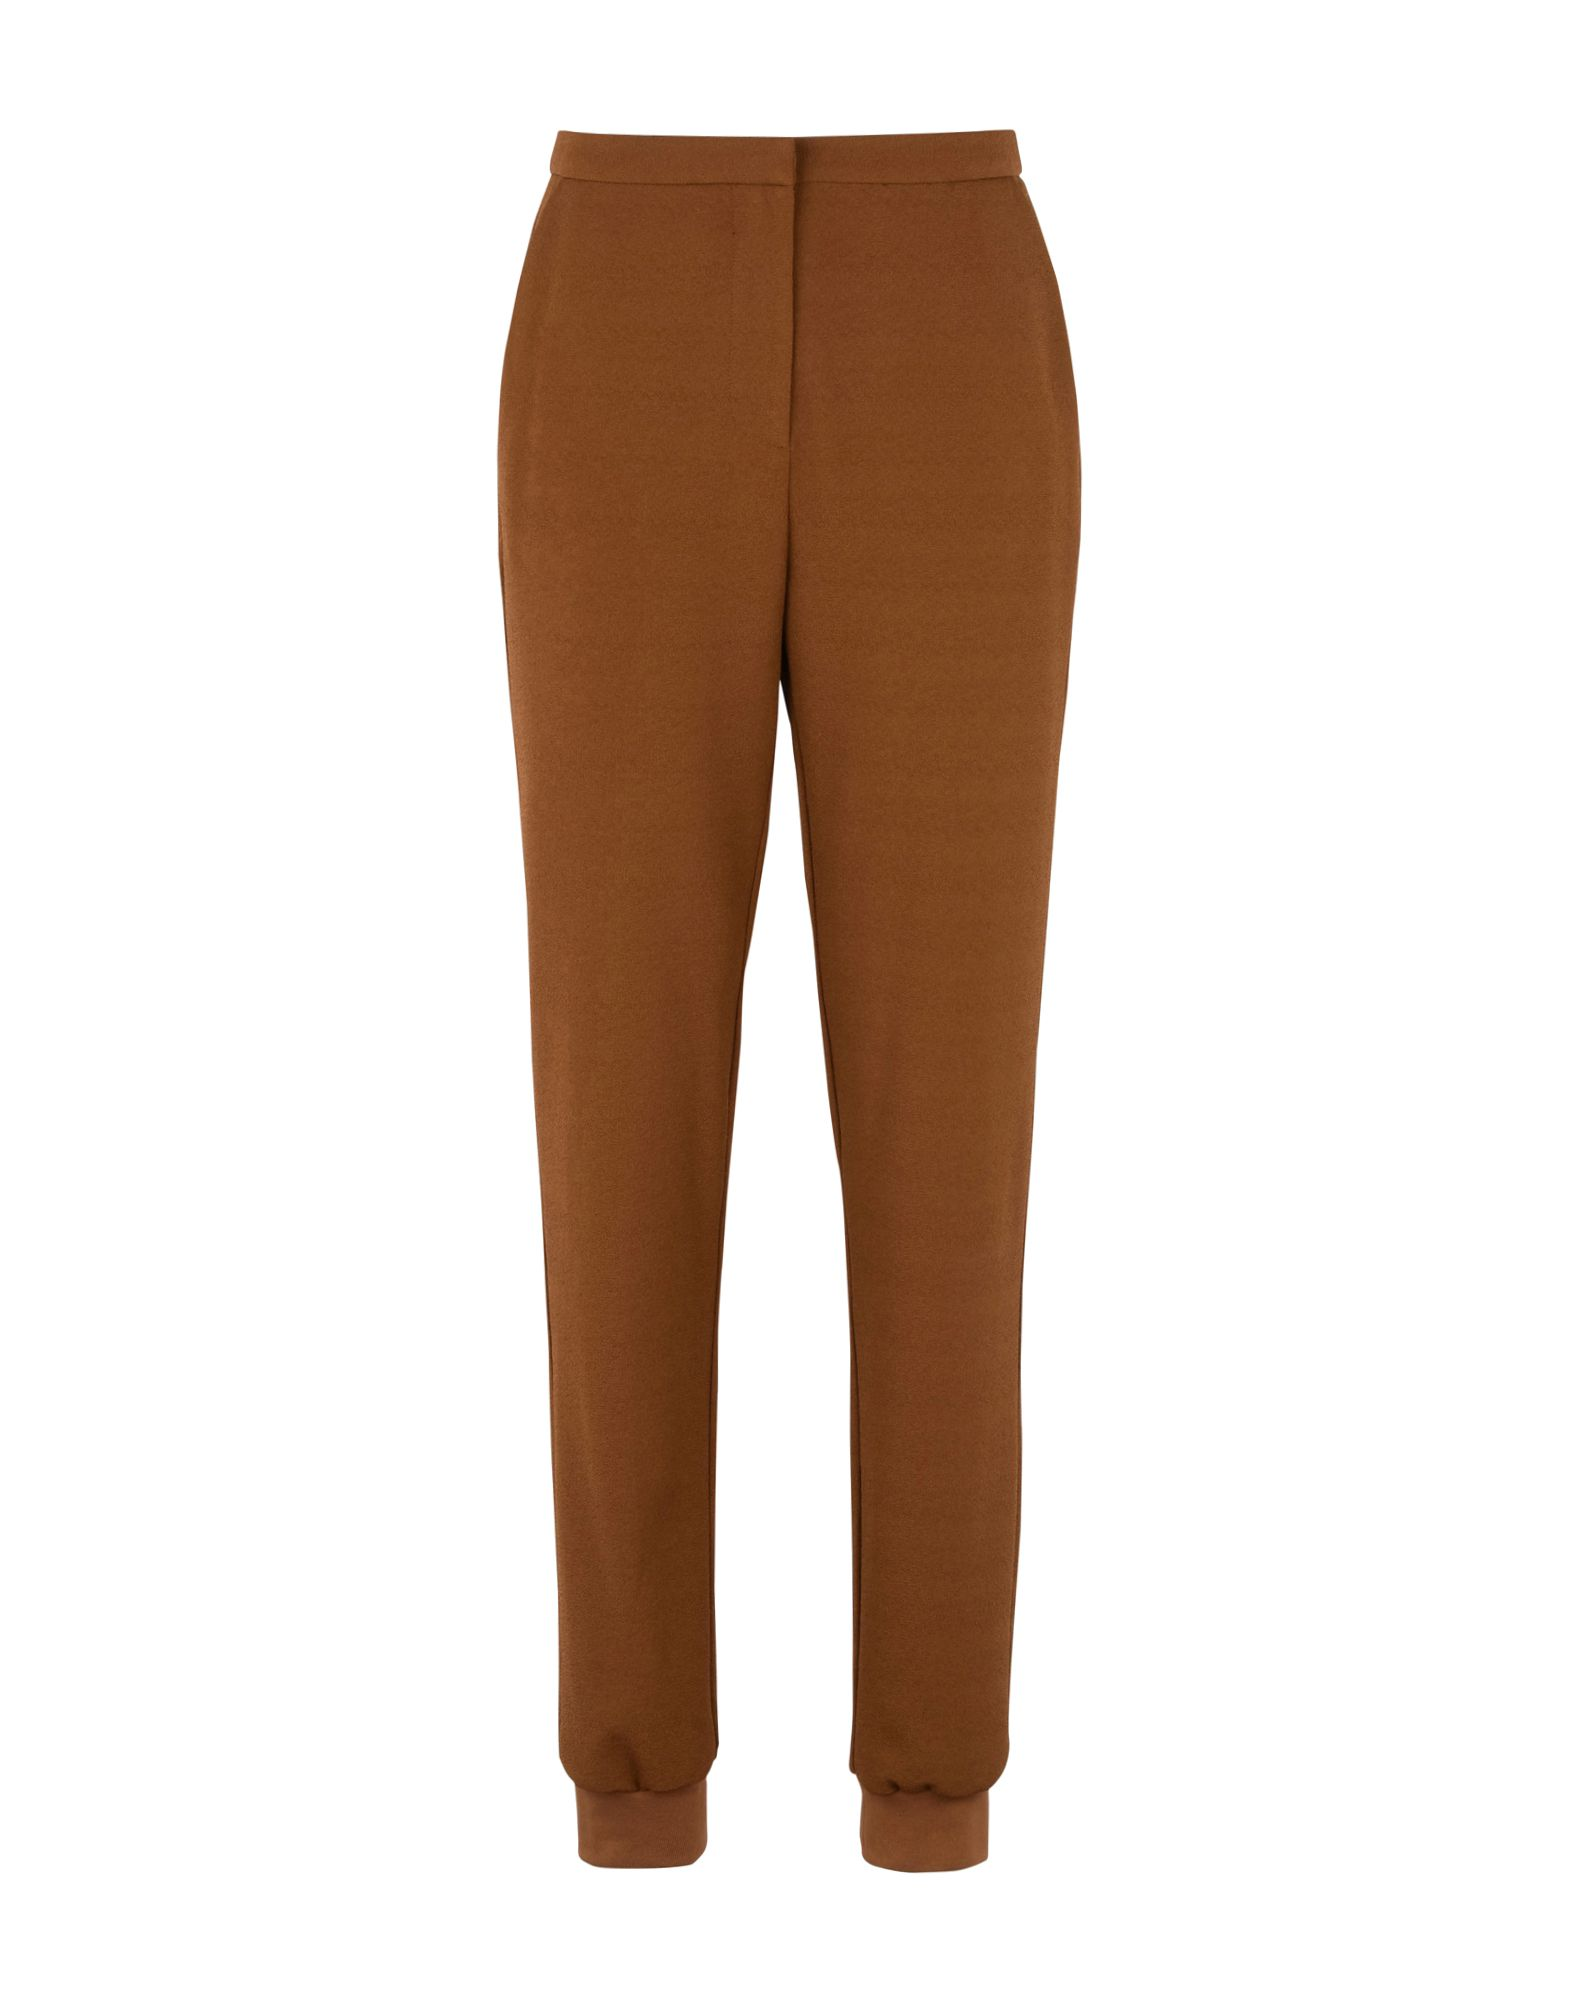 SEE BY CHLOÉ Повседневные брюки see by chloé повседневные брюки